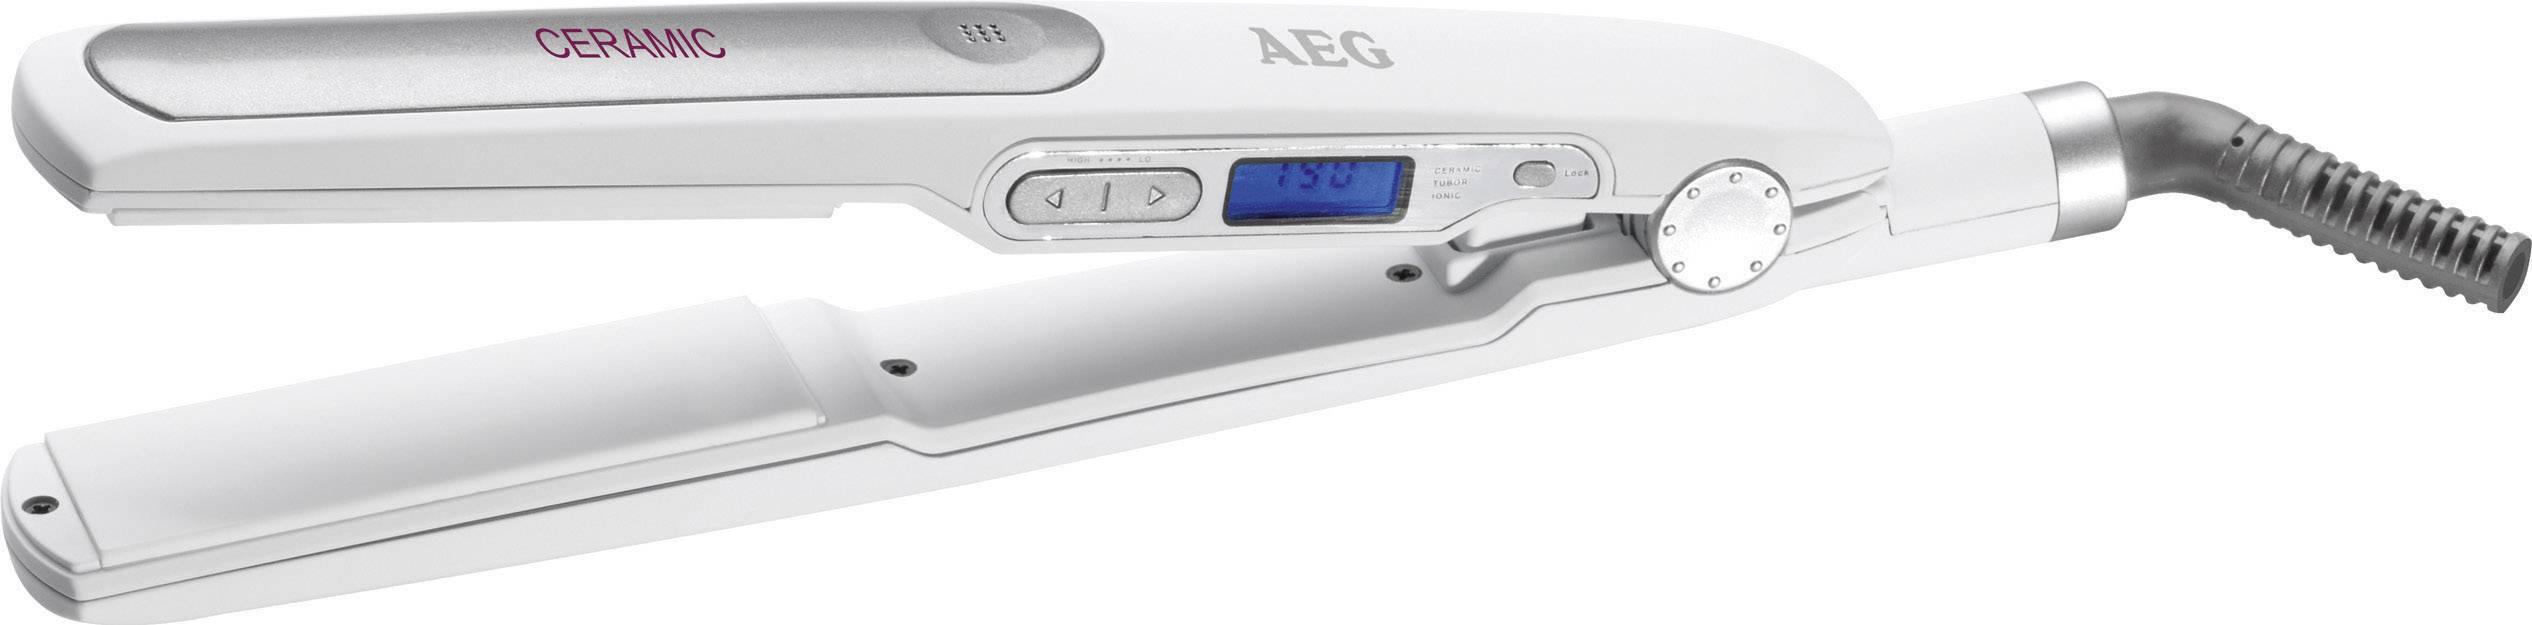 Žehlička na vlasy AEG HC 5585 s keramickým tělískem a LCD, bílá